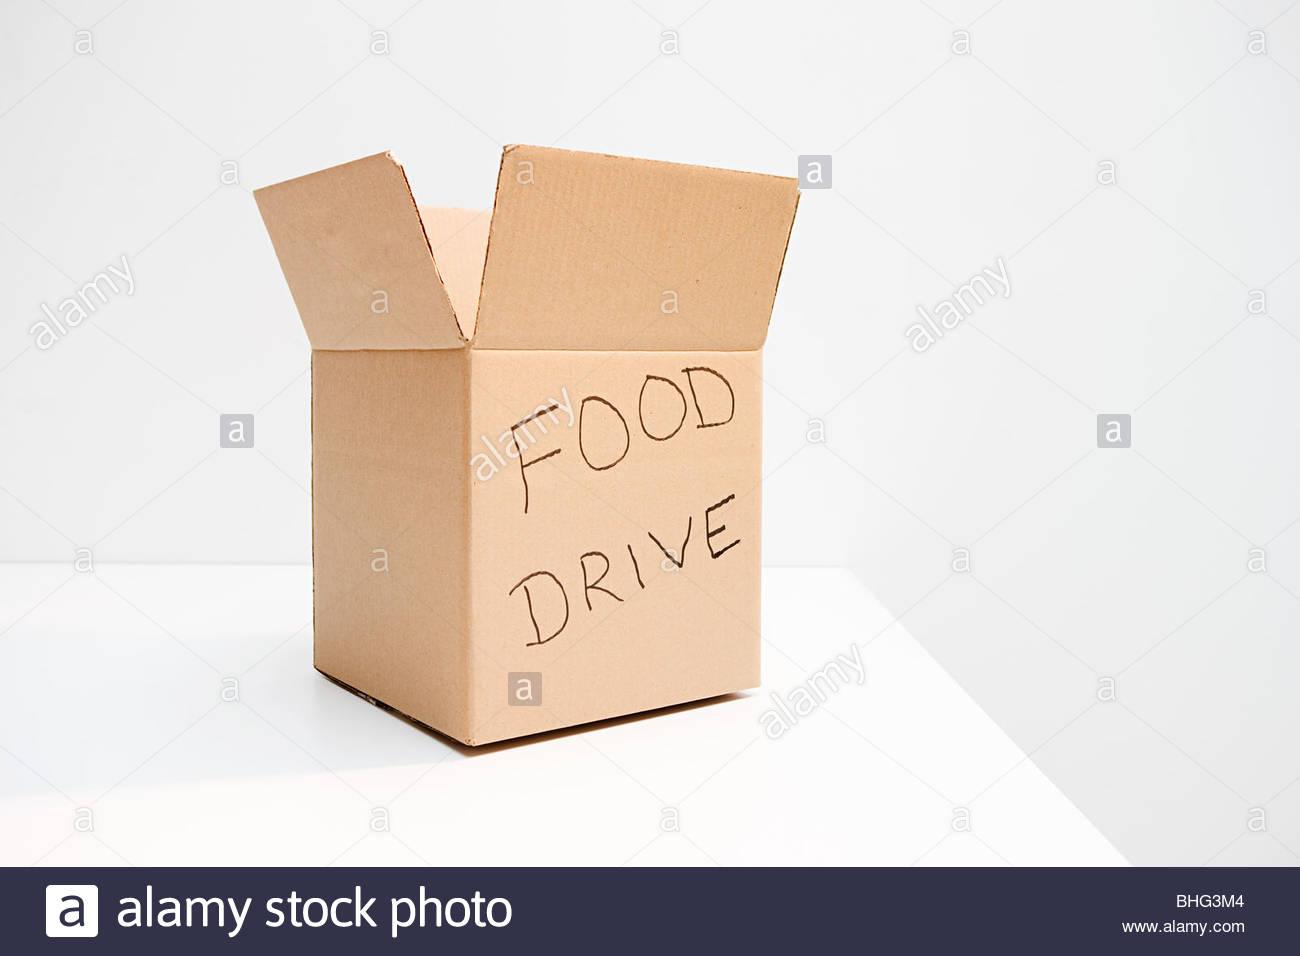 Food drive box - Stock Image